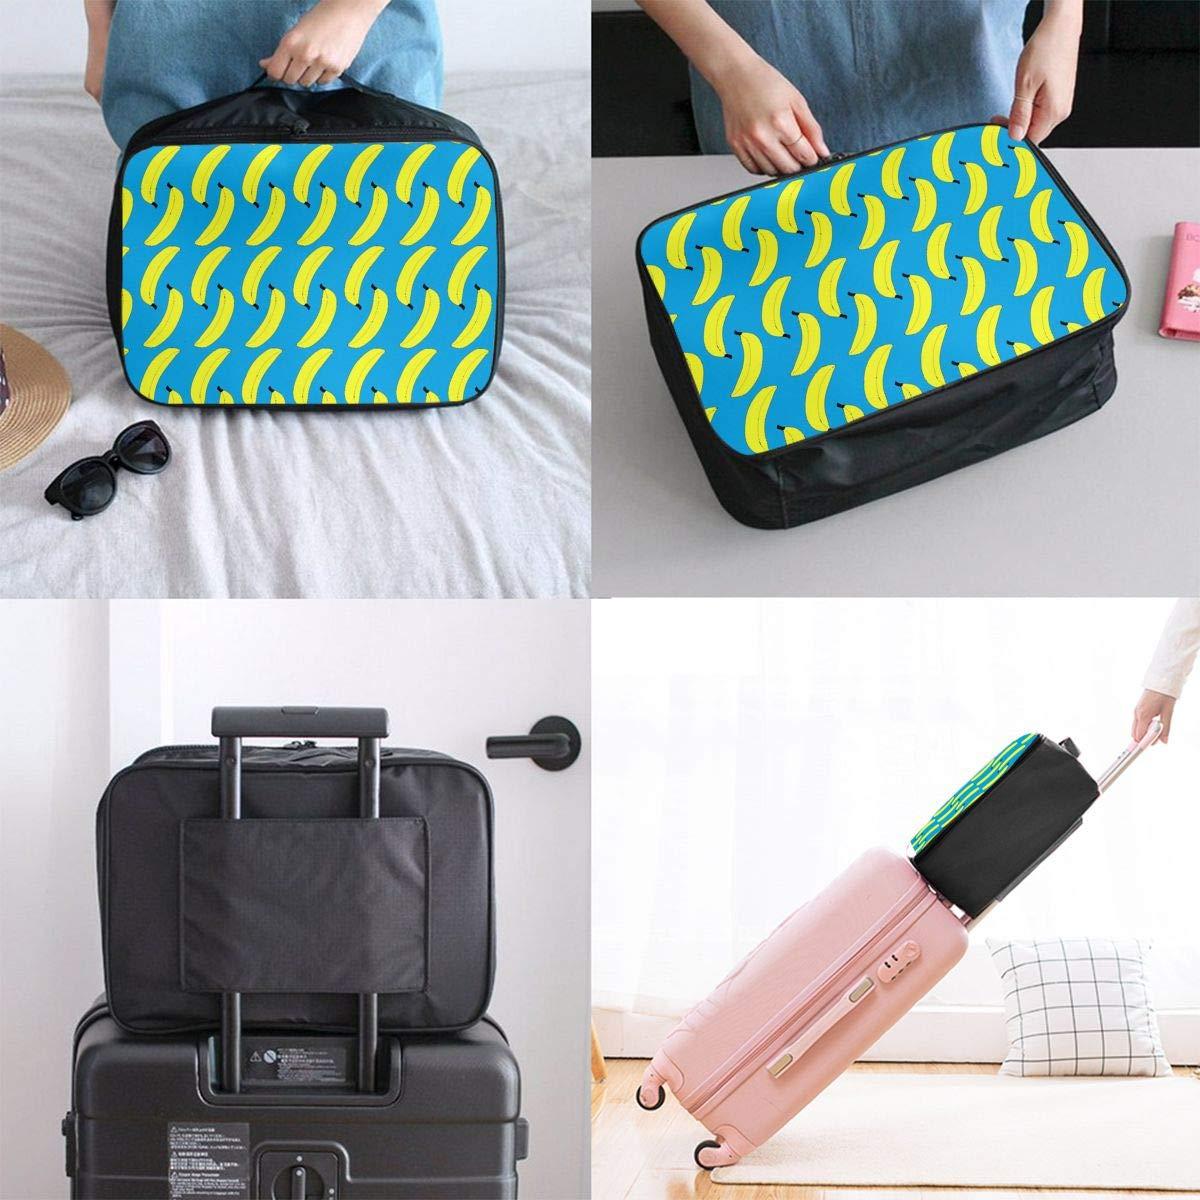 Travel Luggage Duffle Bag Lightweight Portable Handbag Bananas Pattern Large Capacity Waterproof Foldable Storage Tote